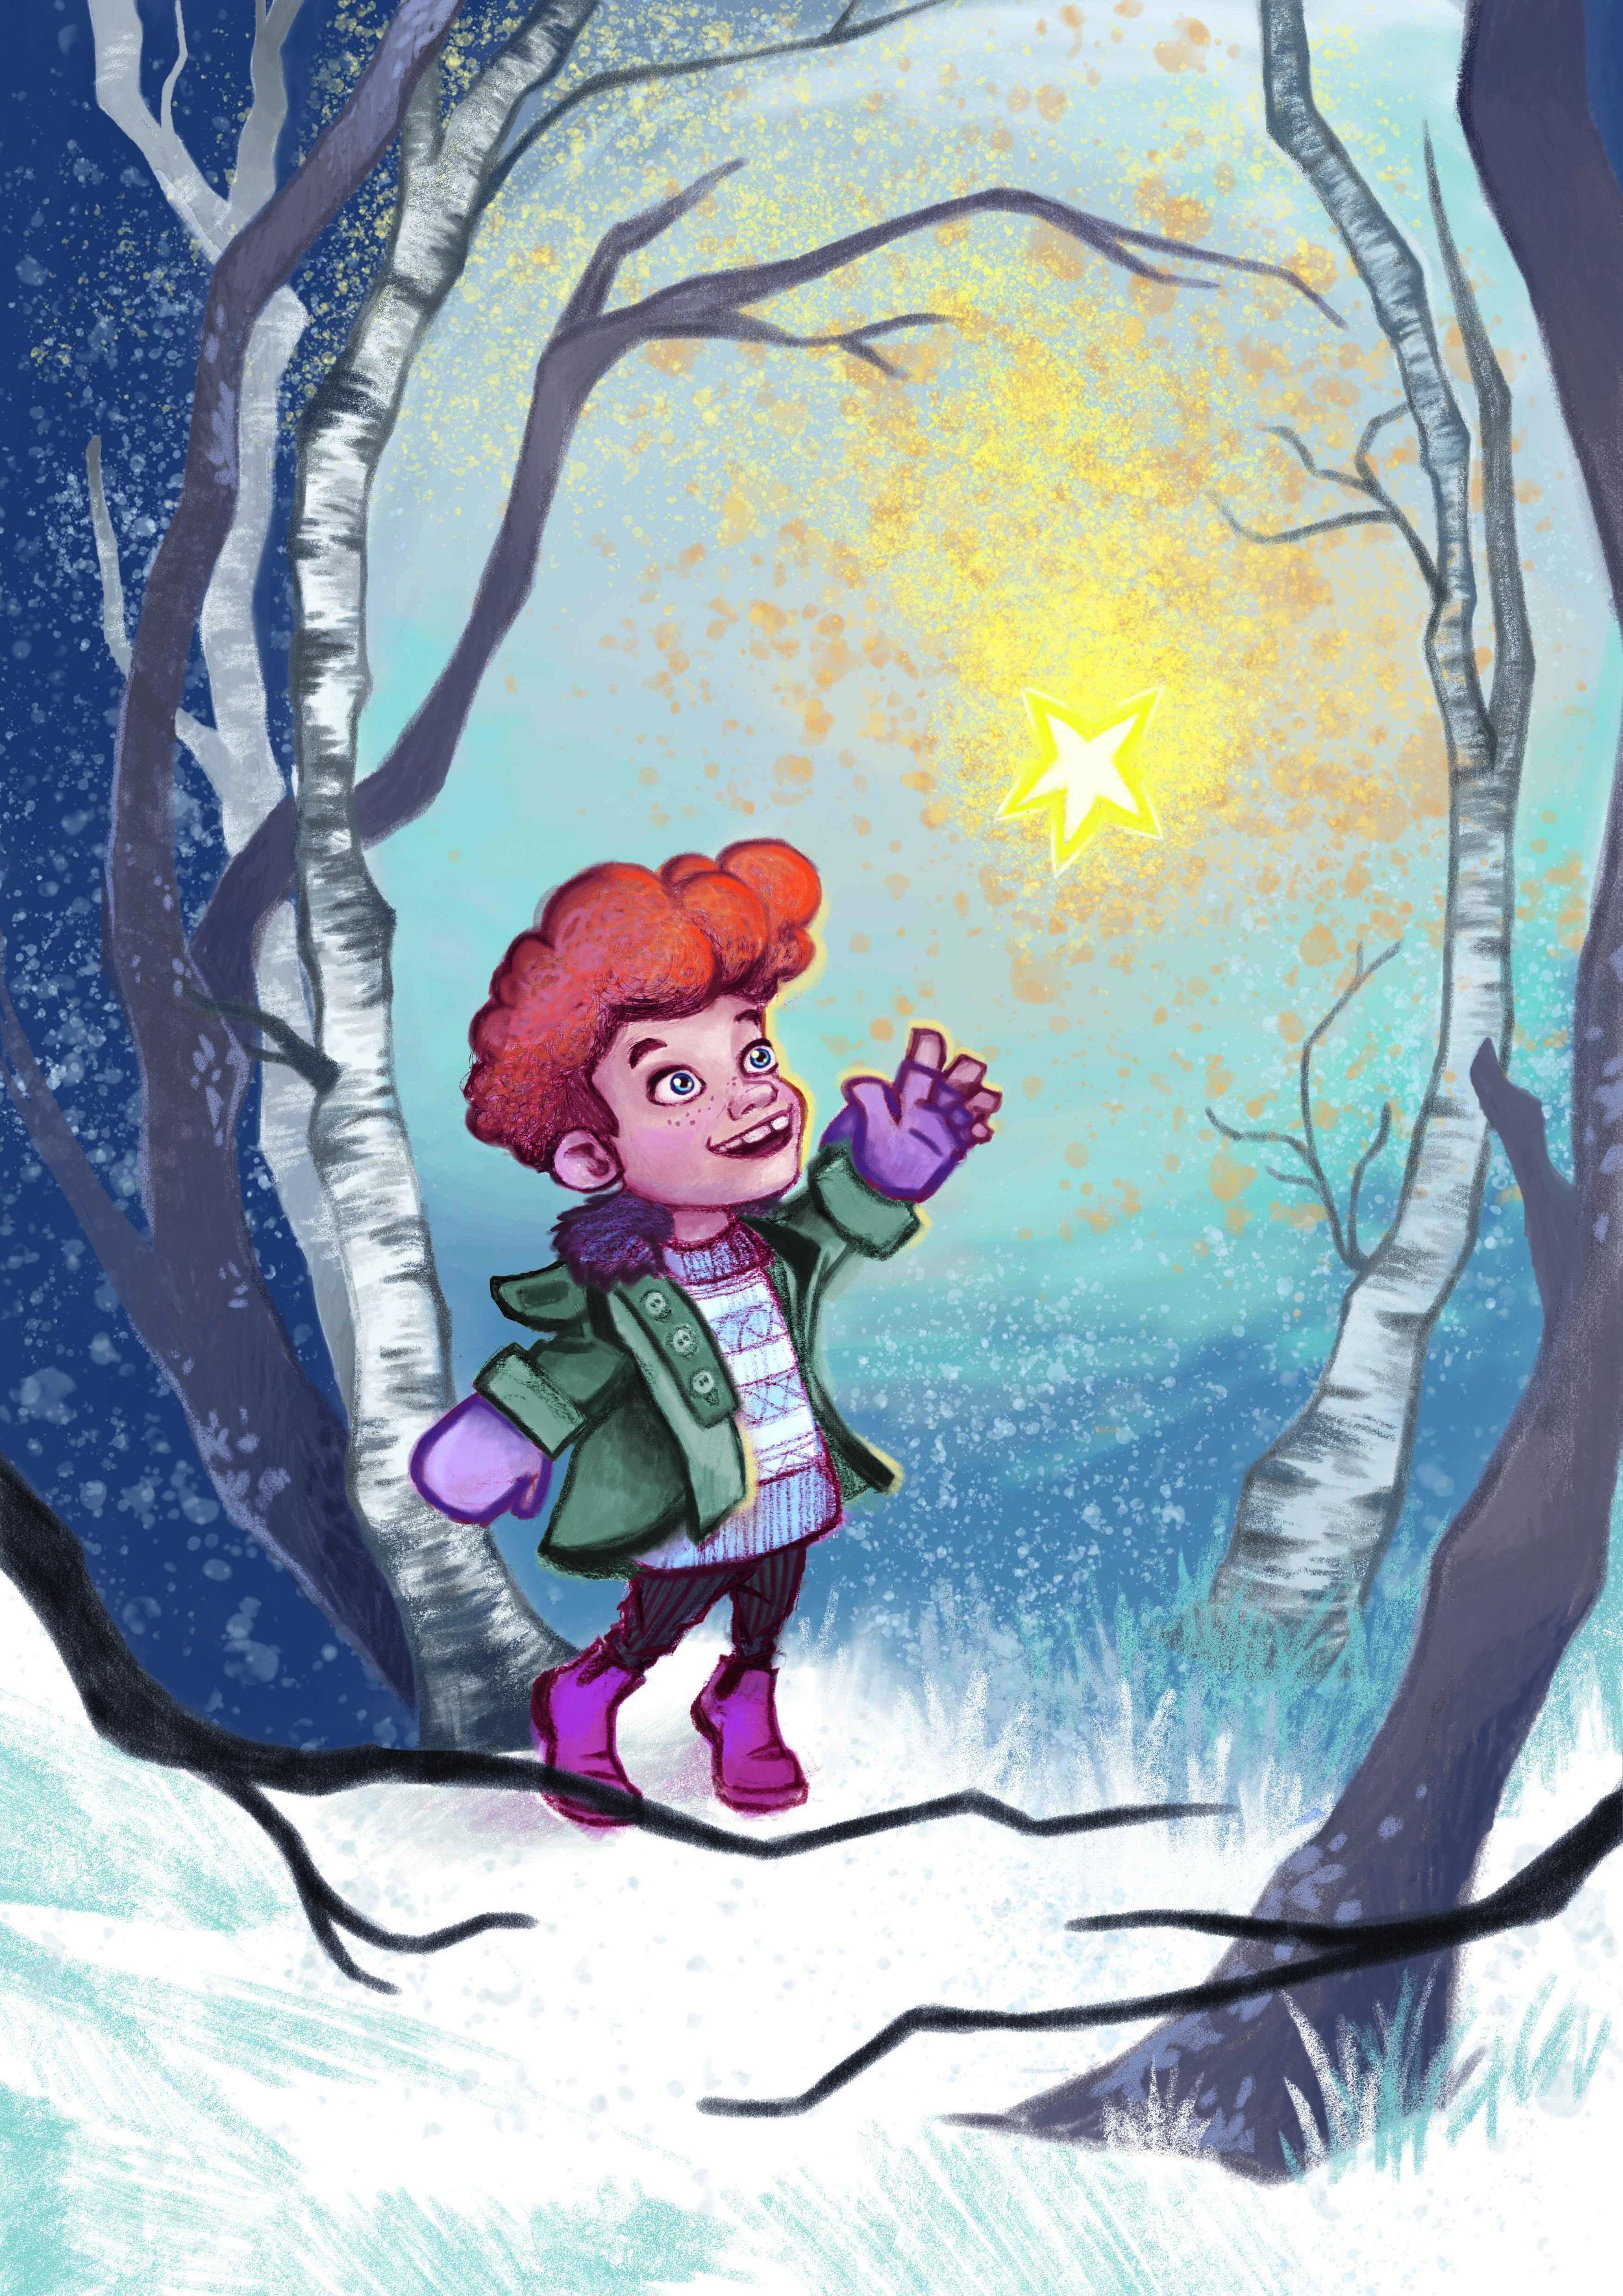 Moxie Finn - Winter Wishes.jpg